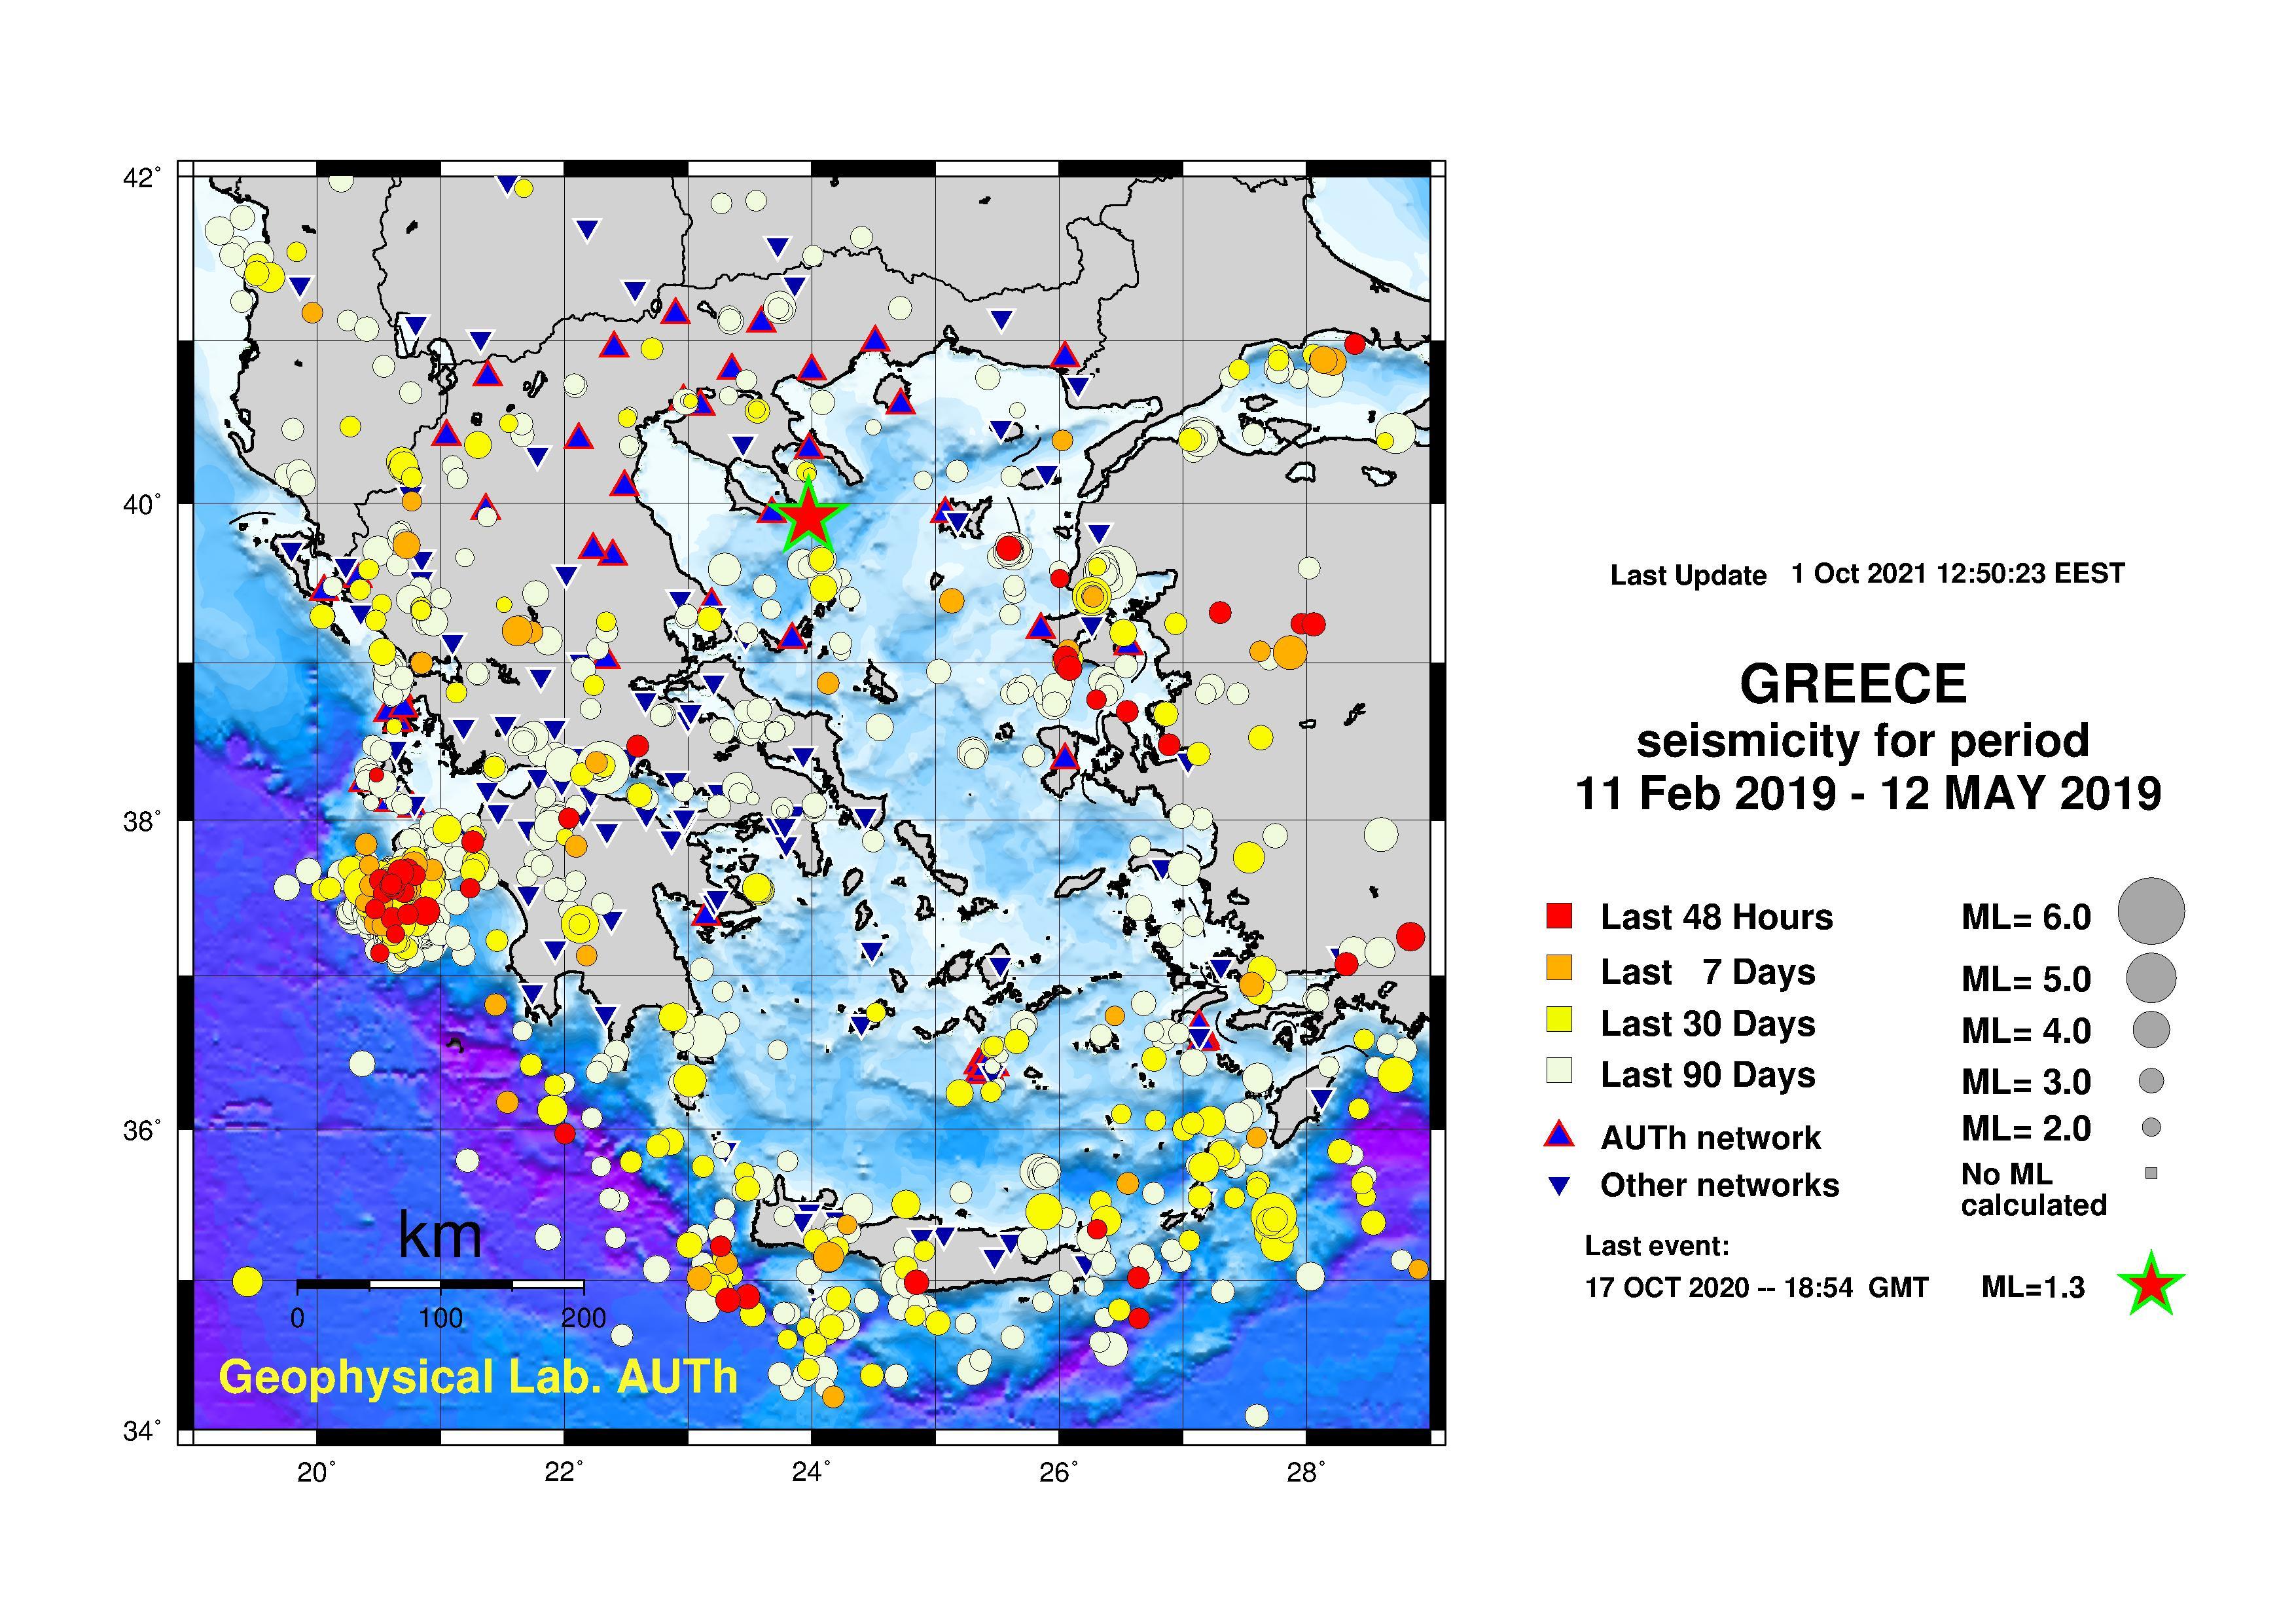 CURRENT SEISMICITY (GREECE)